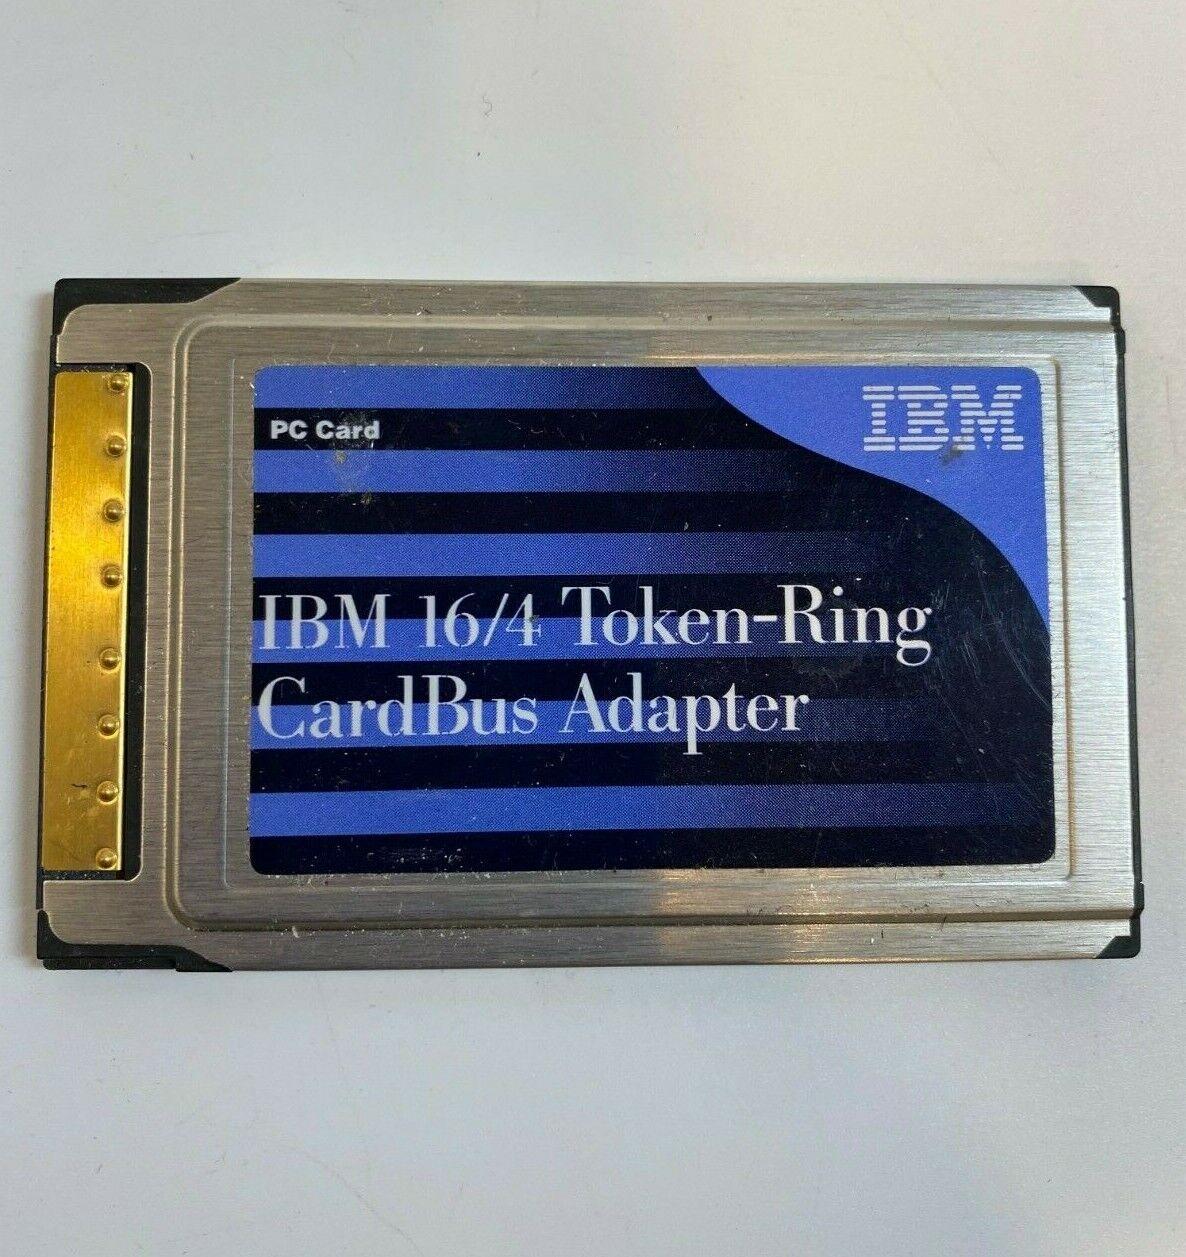 IBM Token Ring 16/4 Cardbus Adapter P/N 34L4899